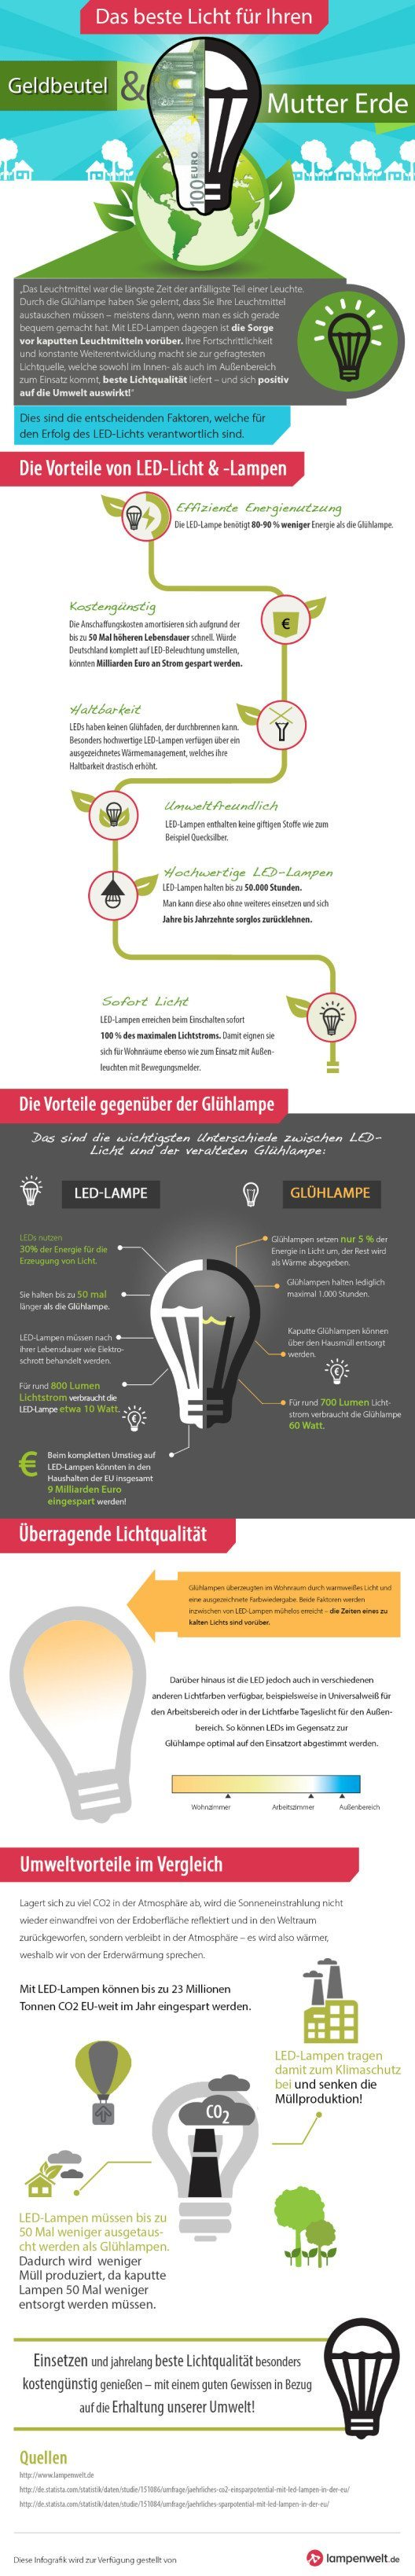 LED Infografik von Lampenwelt